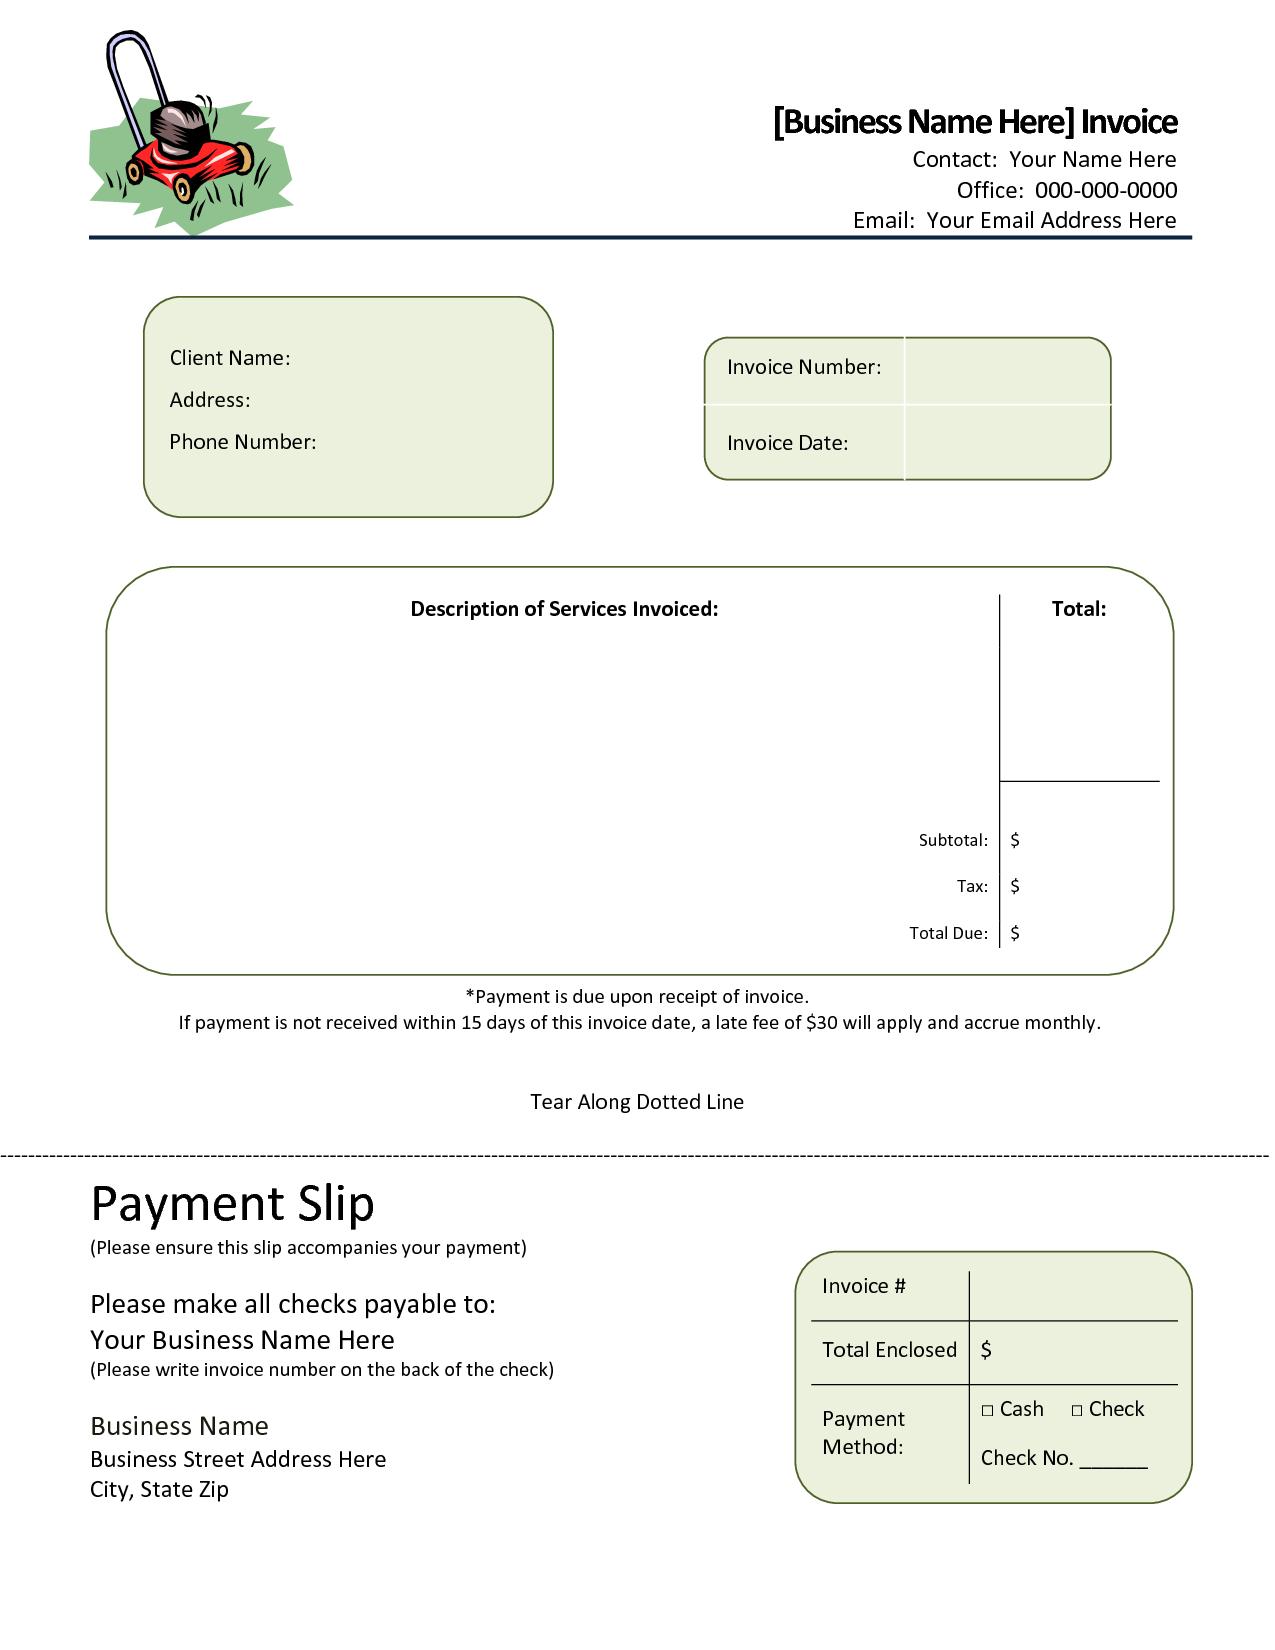 19 Creative Landscape Invoice Template Free For Free For Landscape Invoice Template Free Cards Design Templates